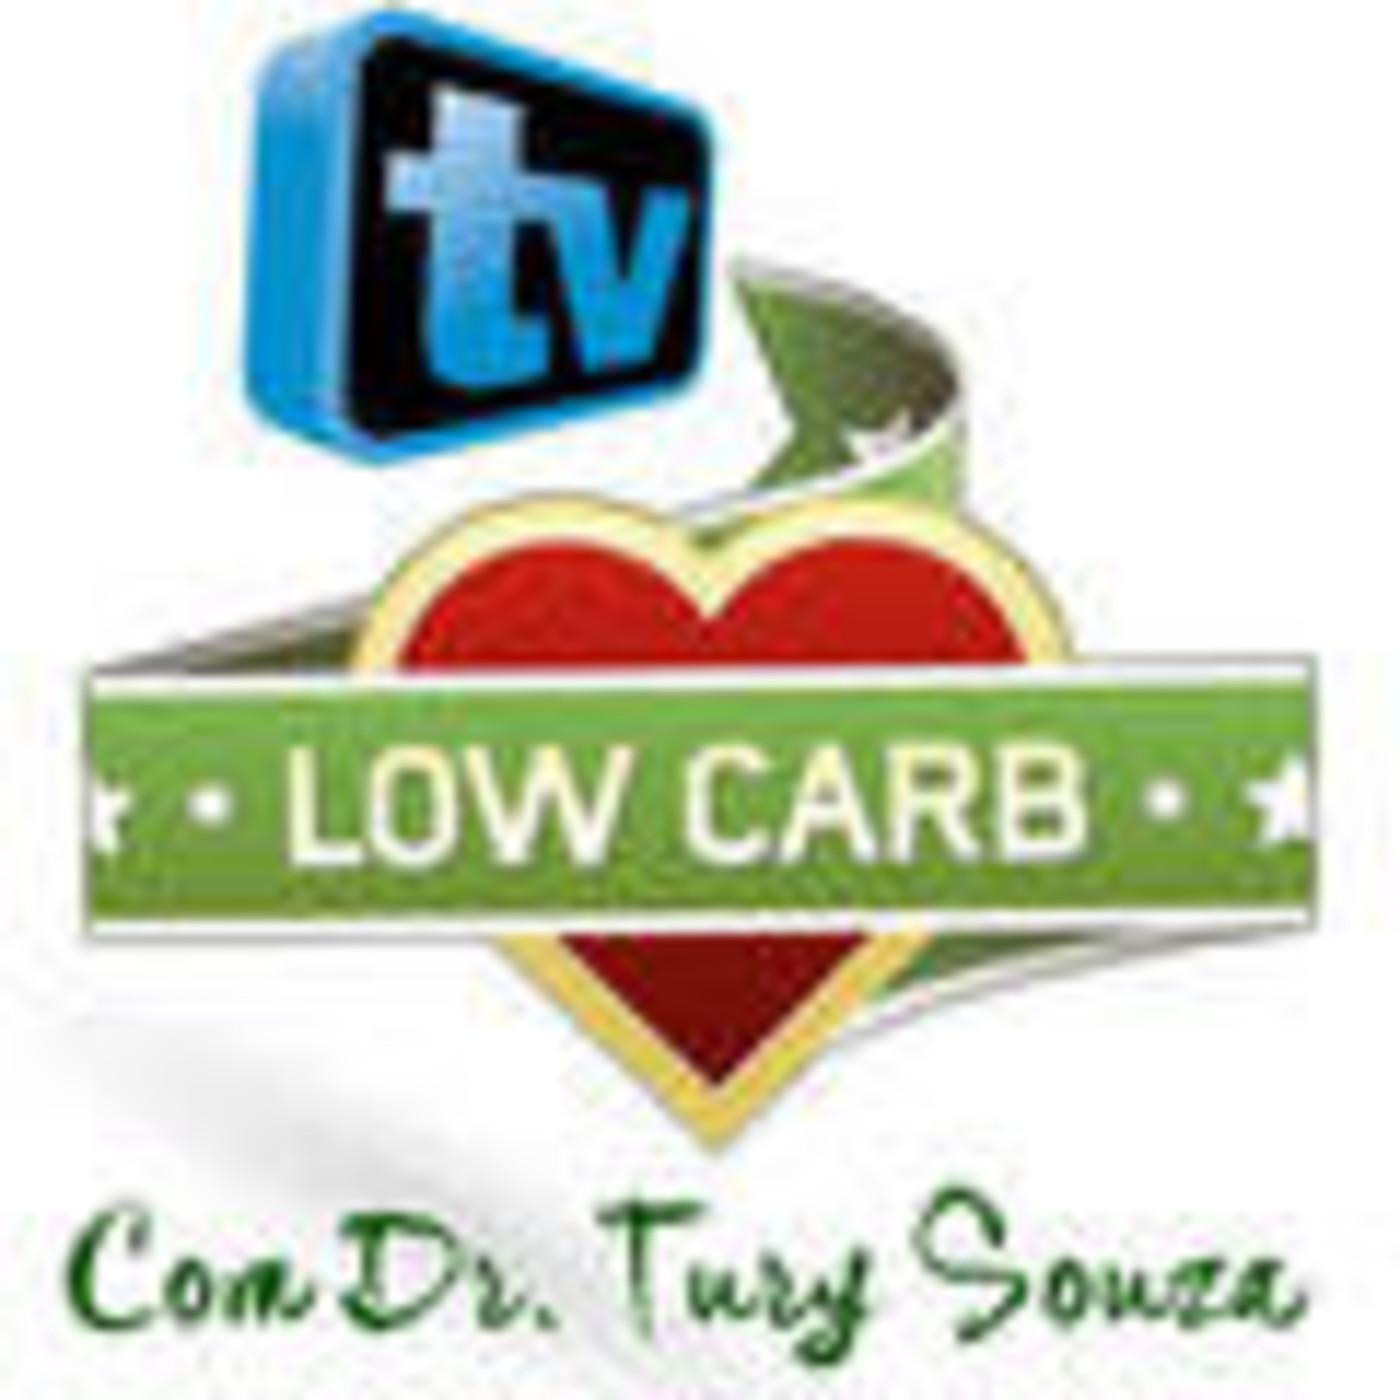 Dr. Tury Souza